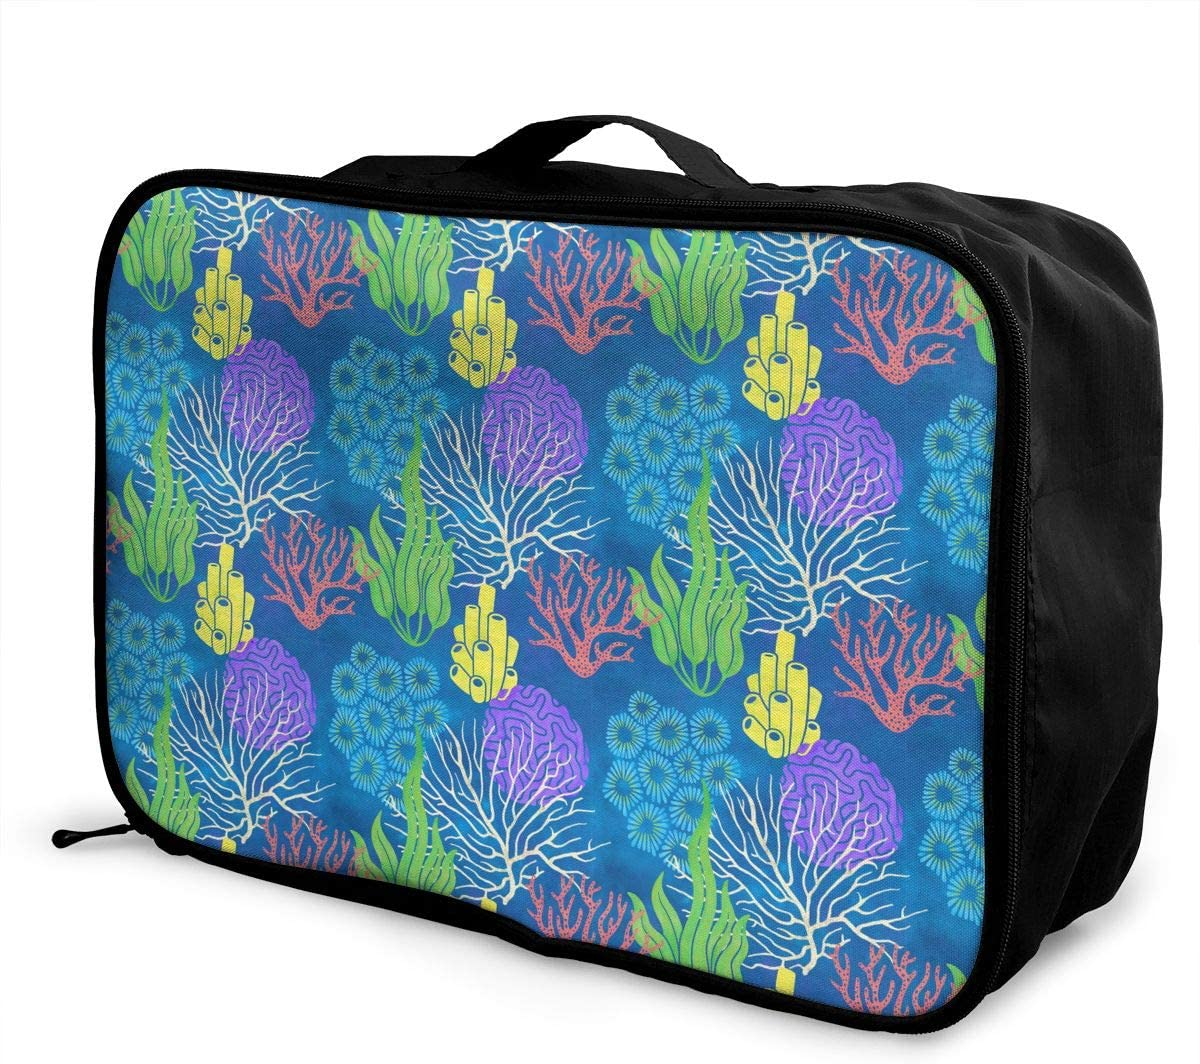 Fun Pattern Travel Carry-on Luggage Weekender Bag Overnight Tote Flight Duffel In Trolley Handle